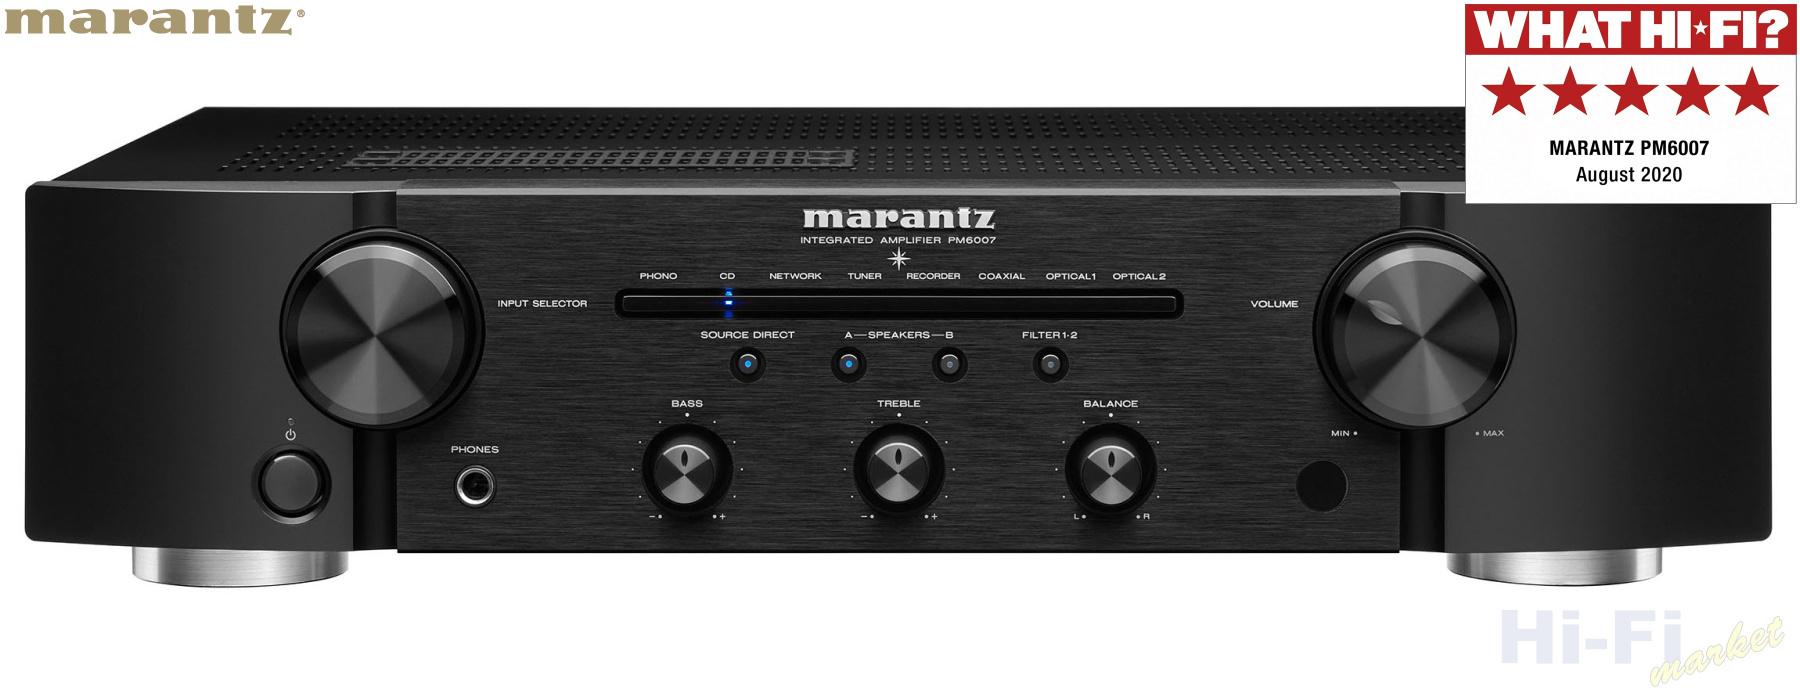 MARANTZ PM6007 black